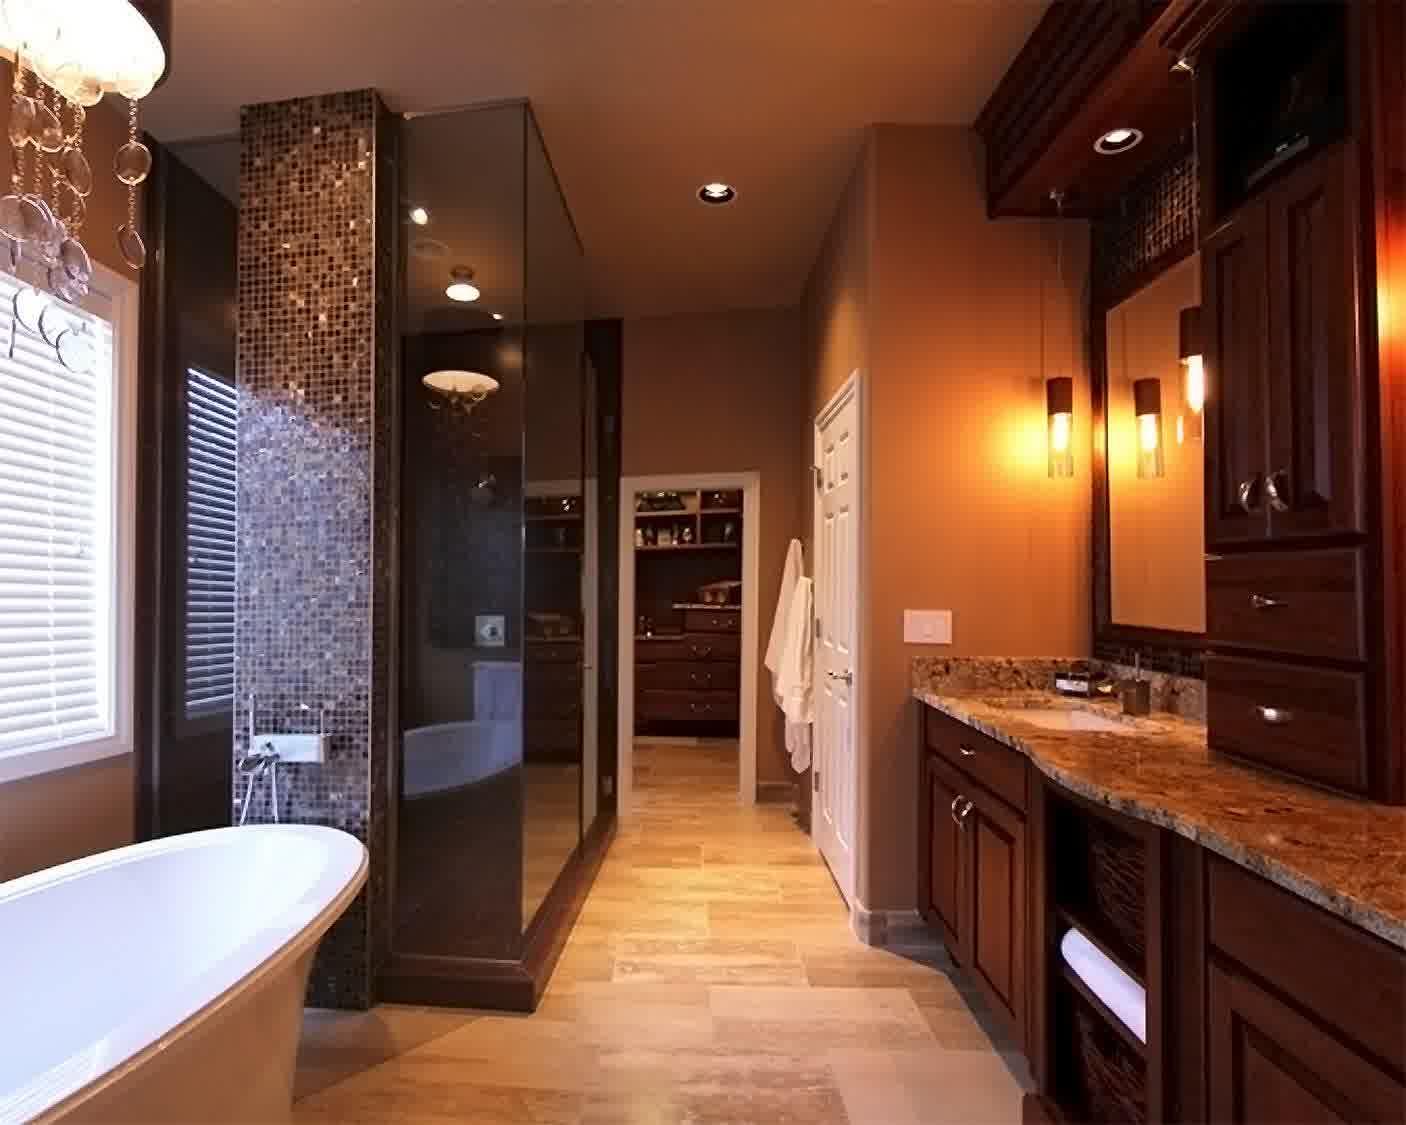 Amazing bathroom remodeling on a wise budget homesfeed - Amazing bathroom ...